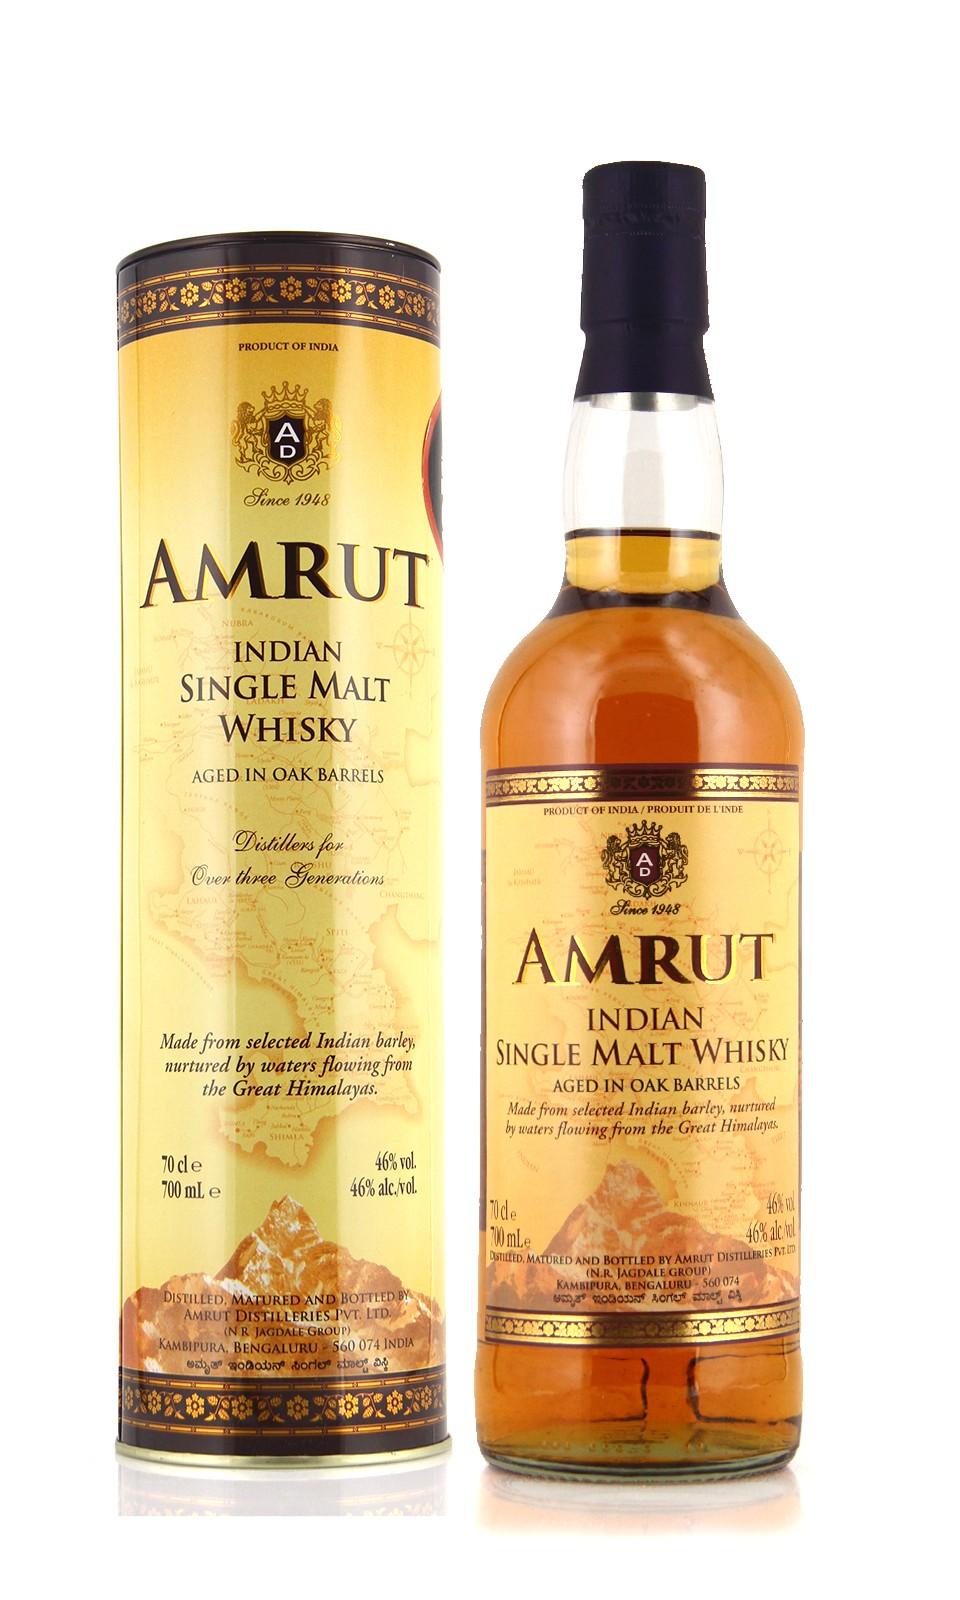 Amrut- Indian single malt whisky